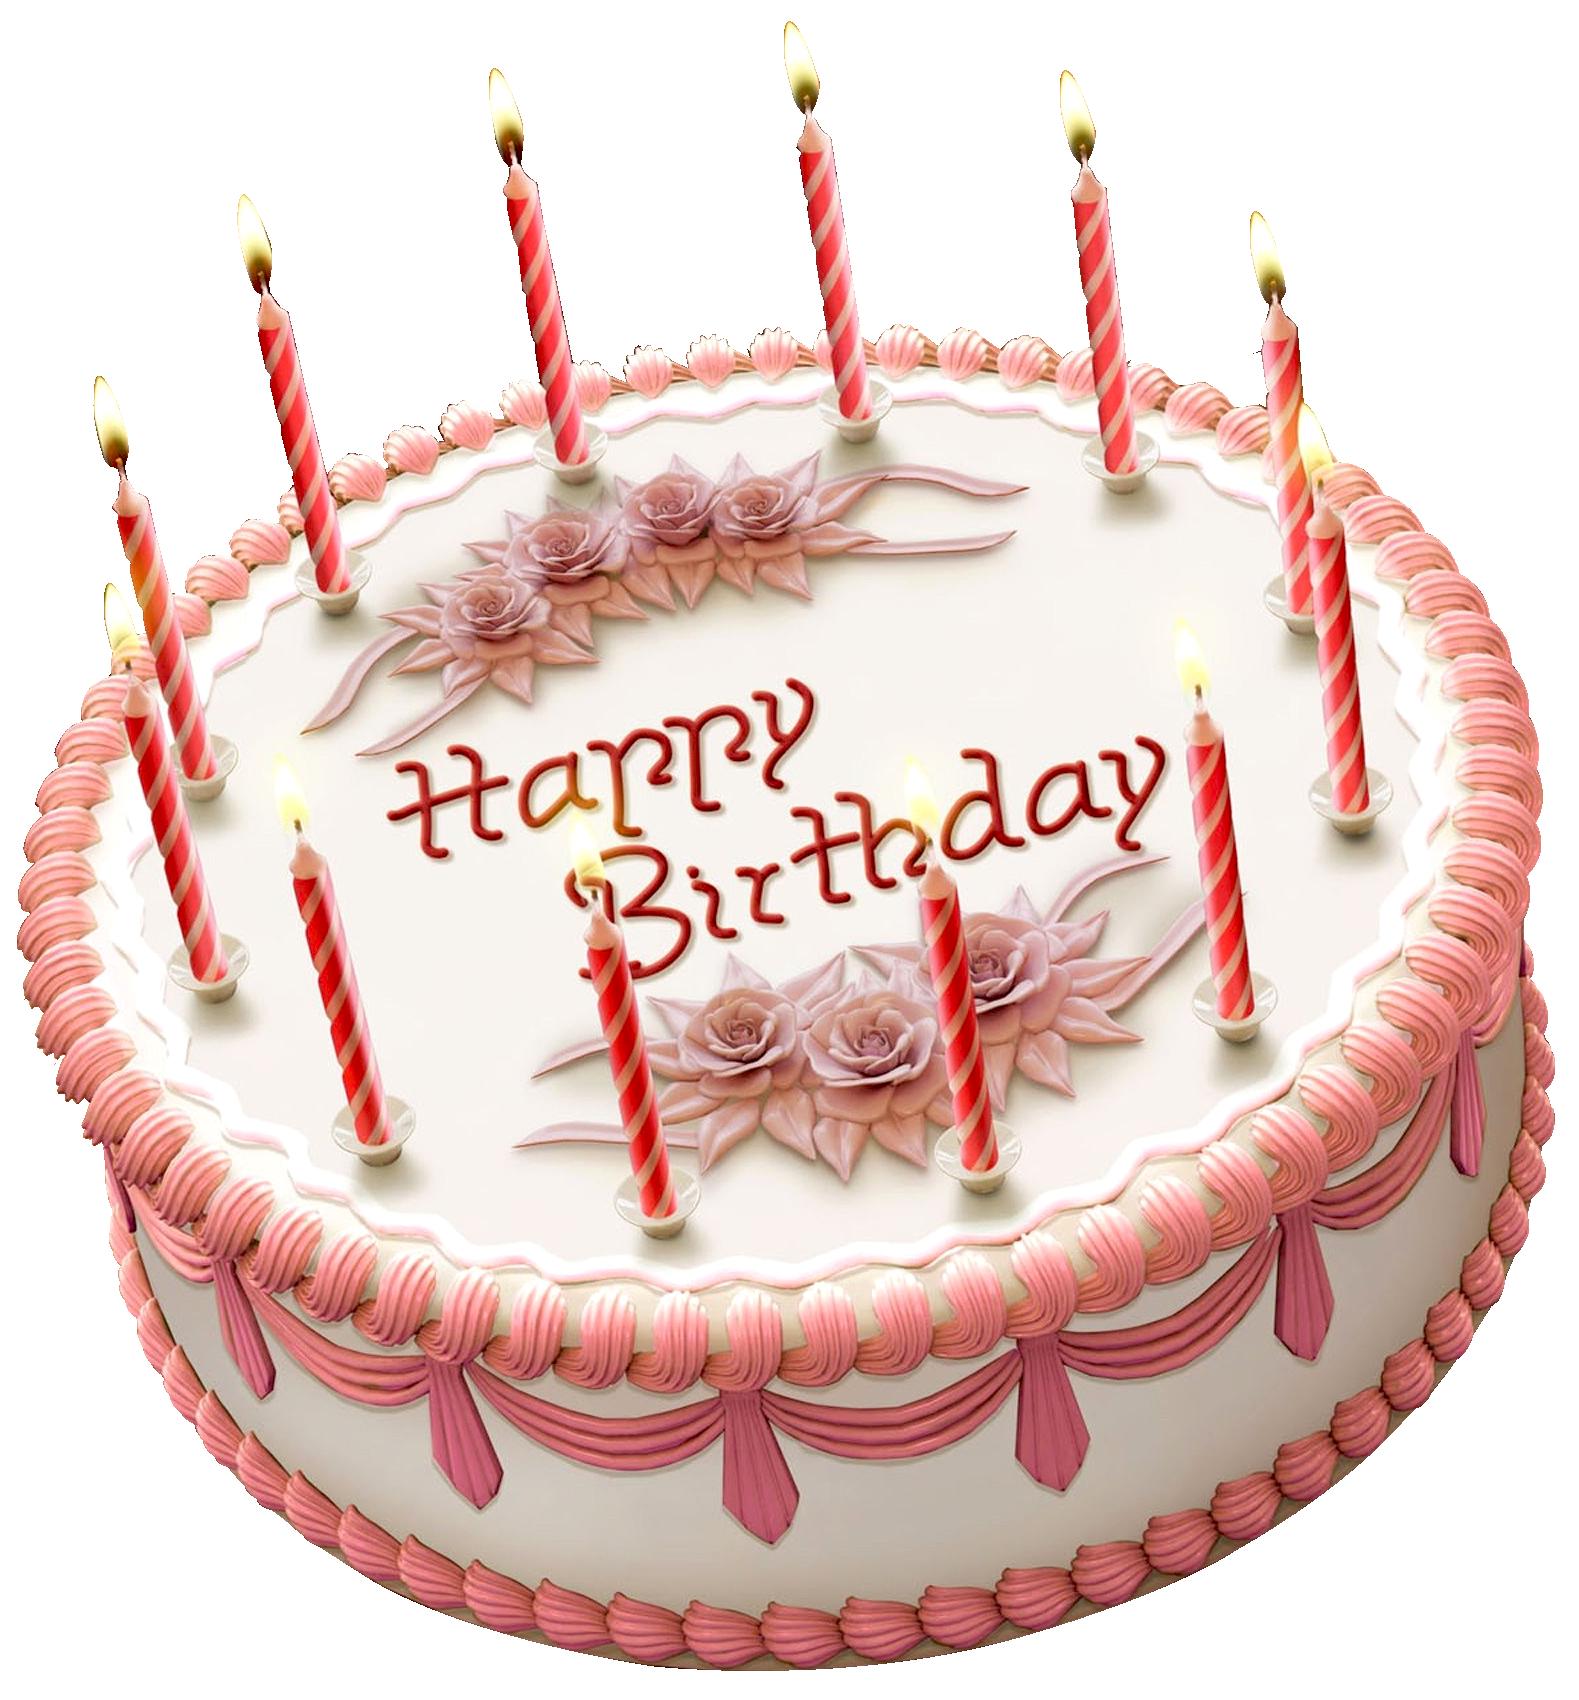 Cake Png Images Free Download Birthday Cake Png Images Free Download